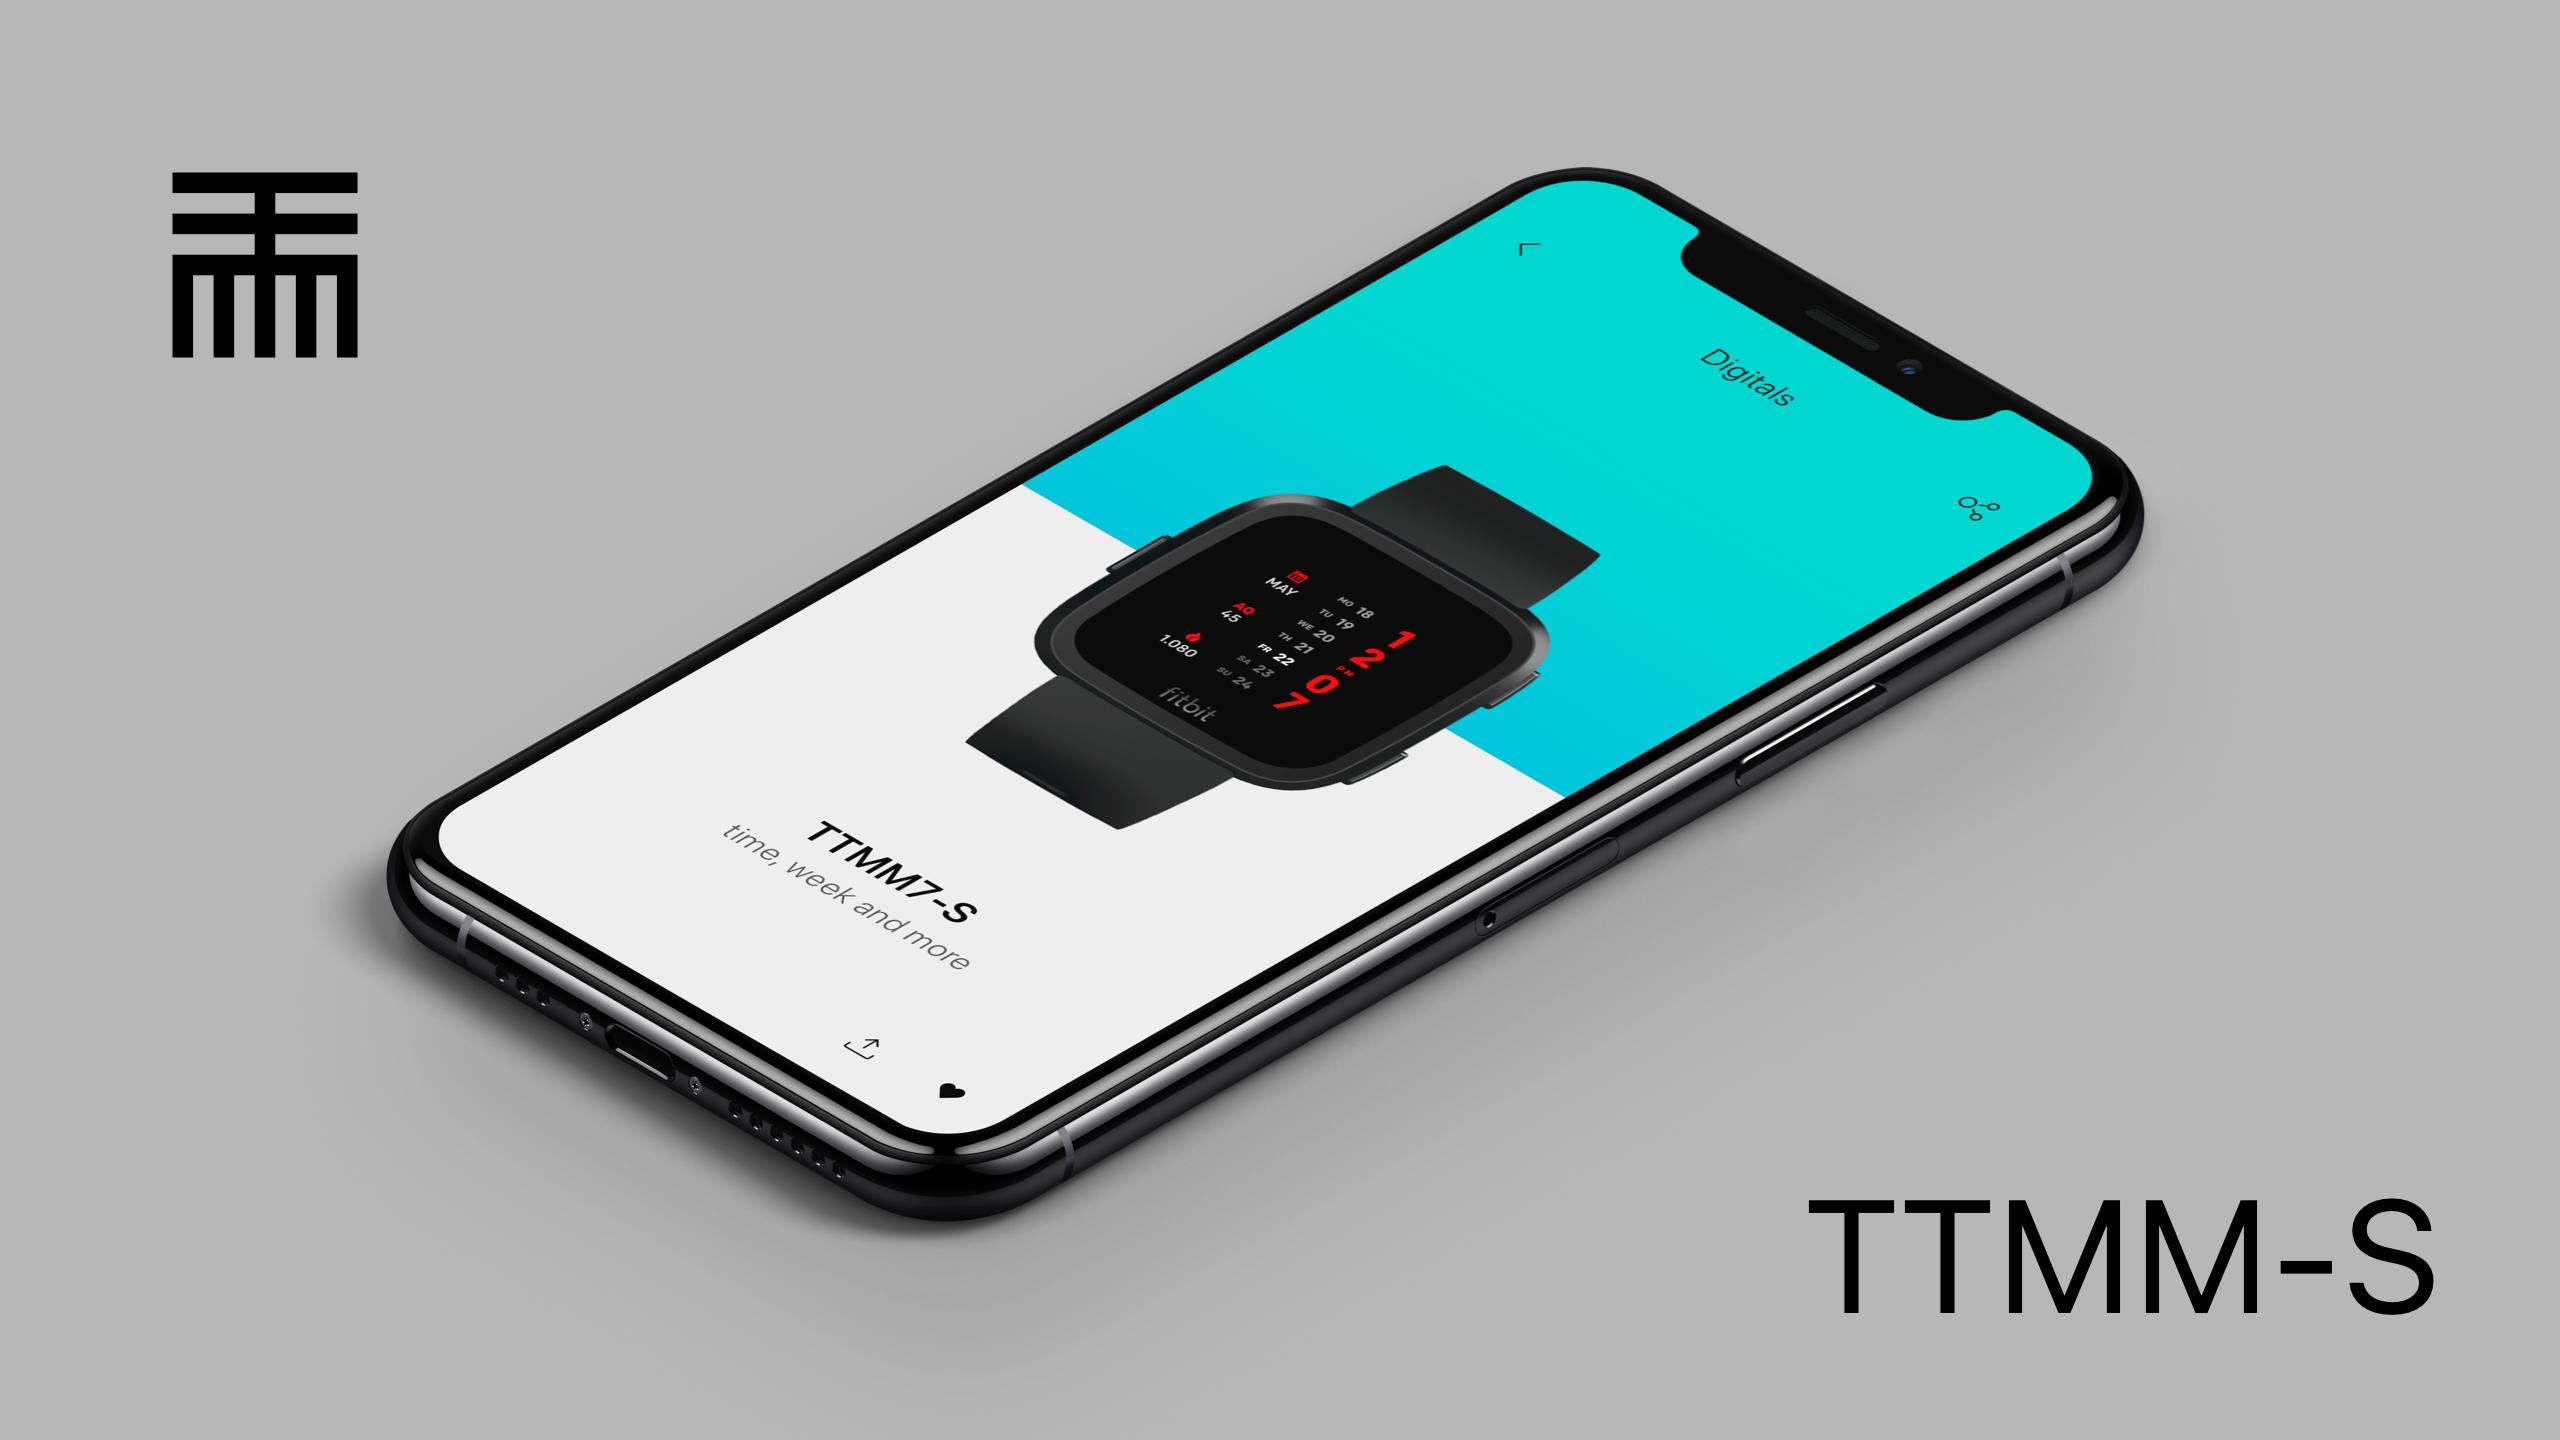 TTMM-S for Fitbit Versa